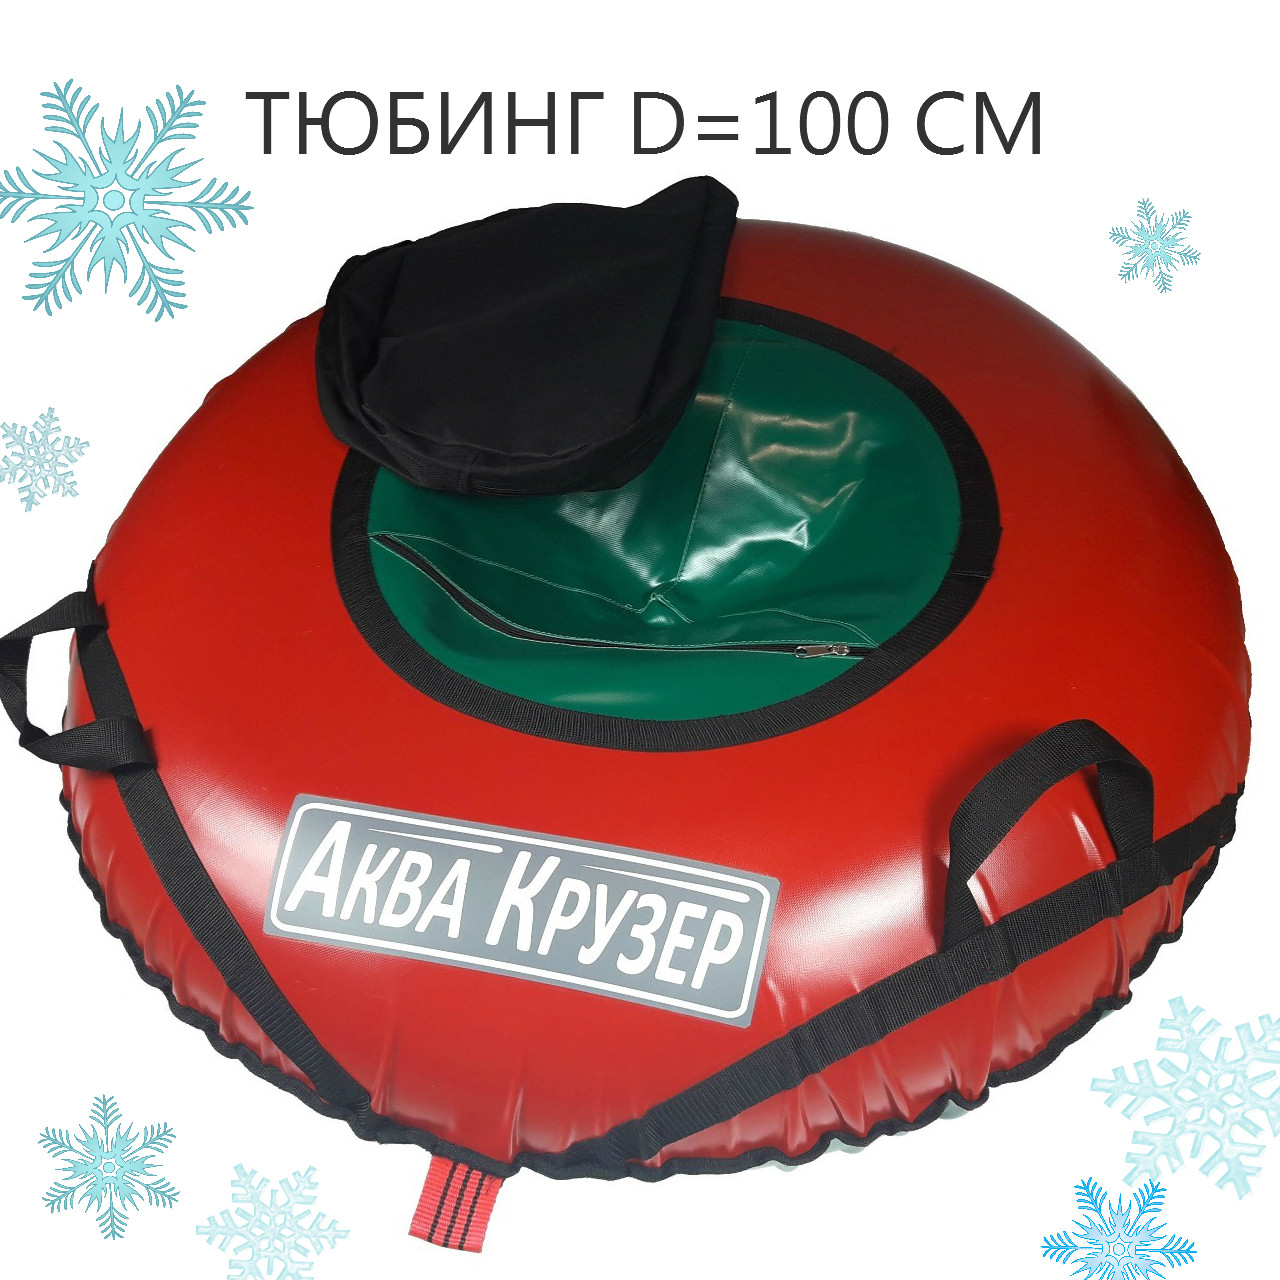 Тюбинг D=100 см - Санки Надувные Аква Крузер (ватрушки) - Аква Крузер / Aqua Cruiser в Харькове